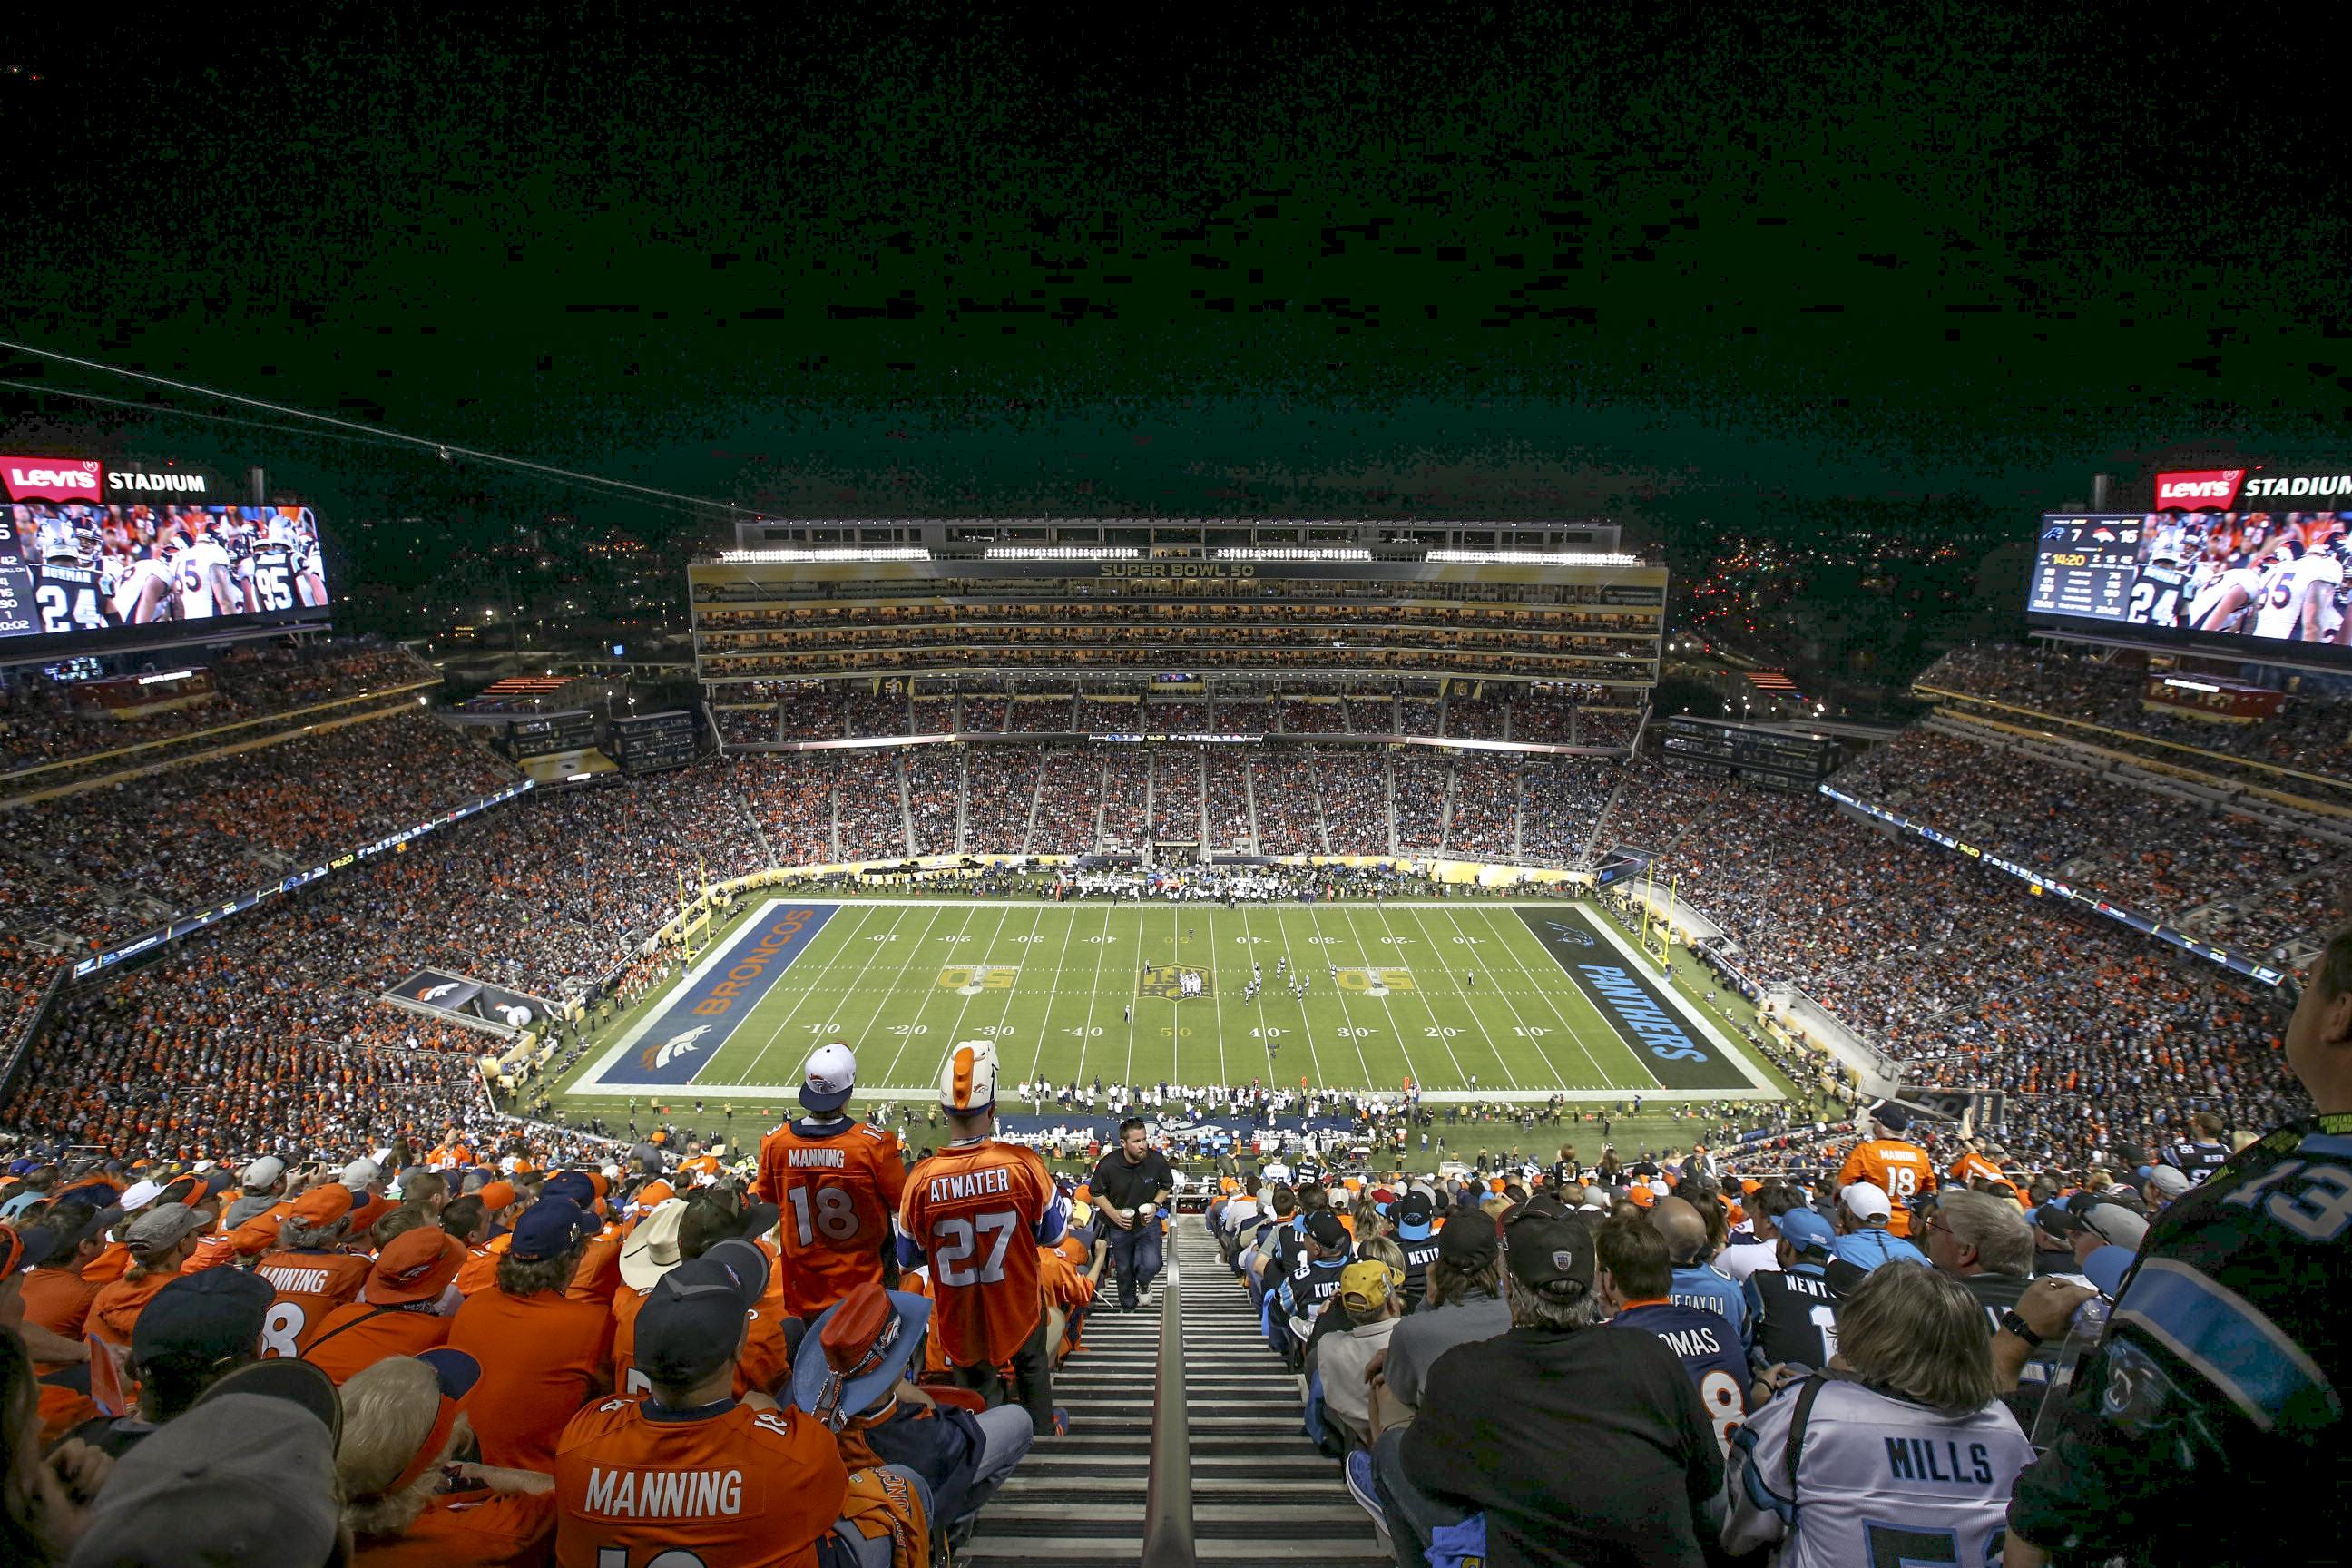 020716-Stadiumviewuptop